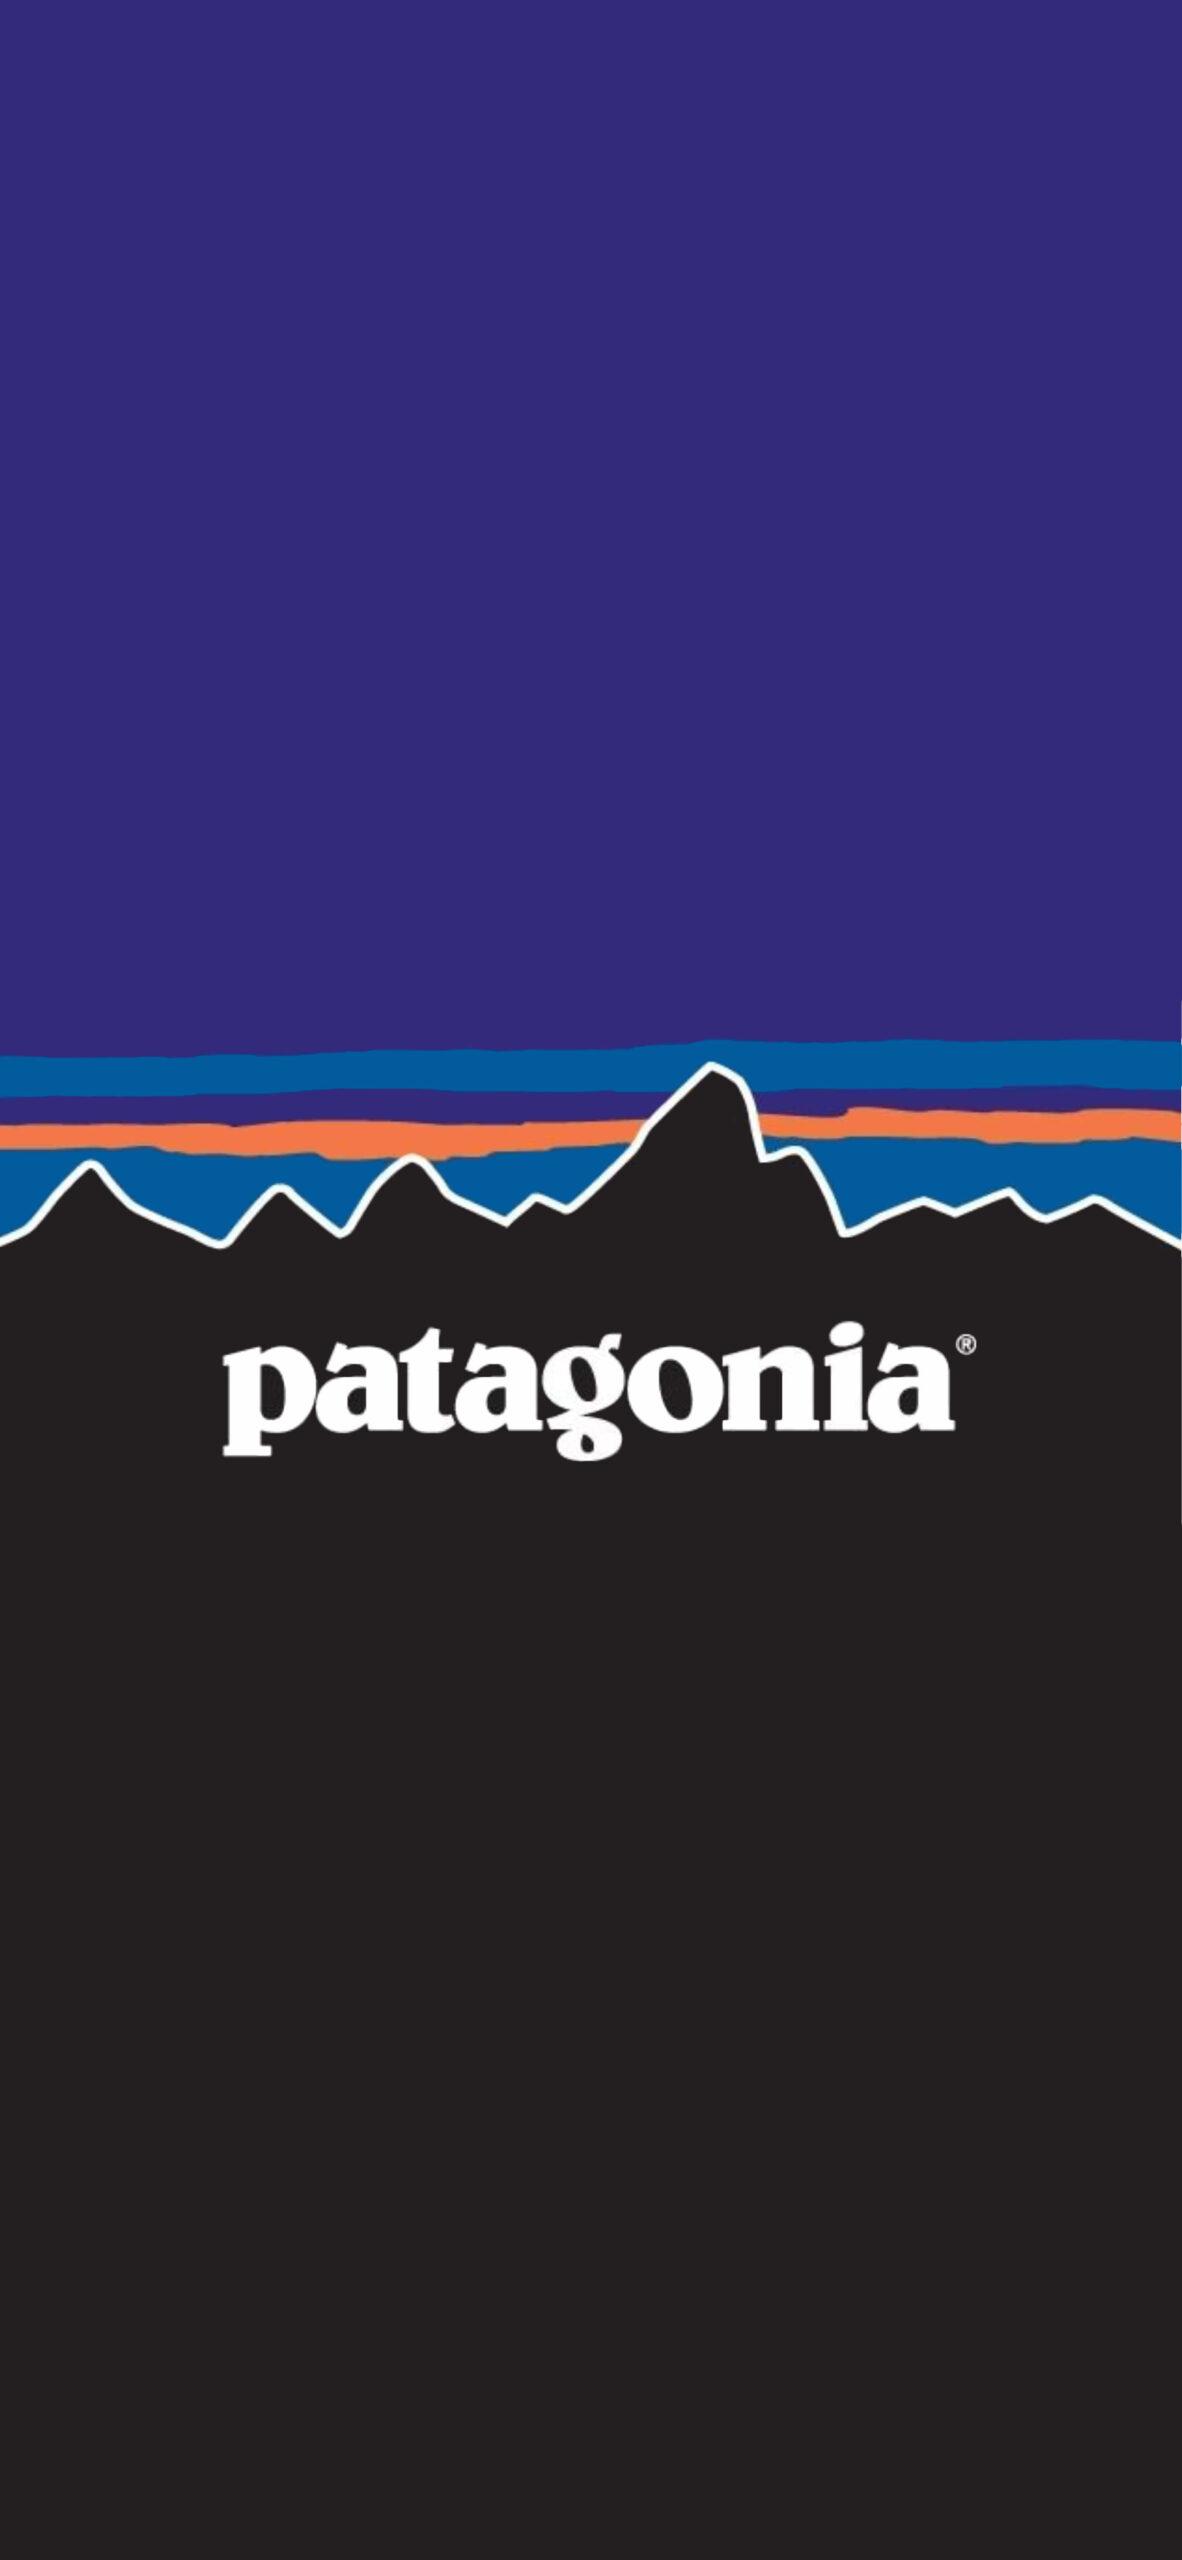 patagonia01 scaled - patagonia/パタゴニアのおしゃれな無料高画質スマホ壁紙82枚 [iPhone&Androidに対応]